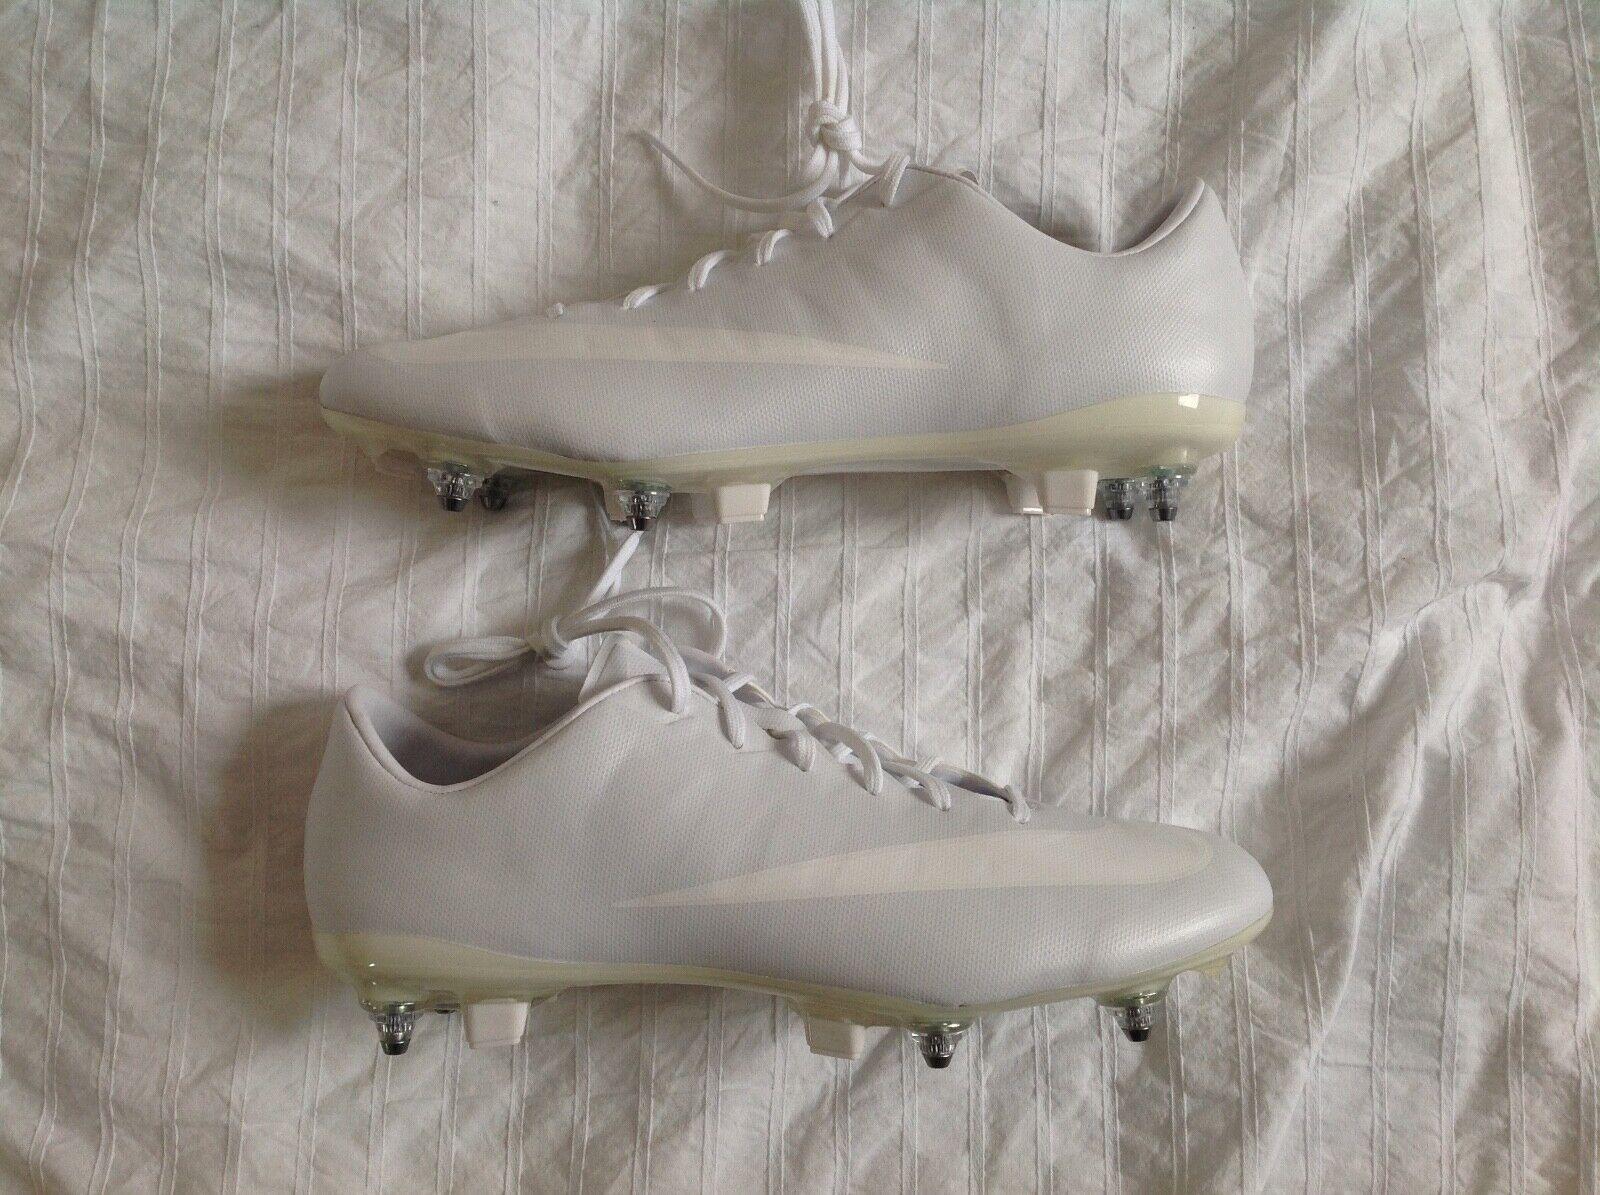 NIKE ID MERCURIAL VAPOR SG FOOTBALL BOOTS US 9 WHITEOUT WHITE RARE